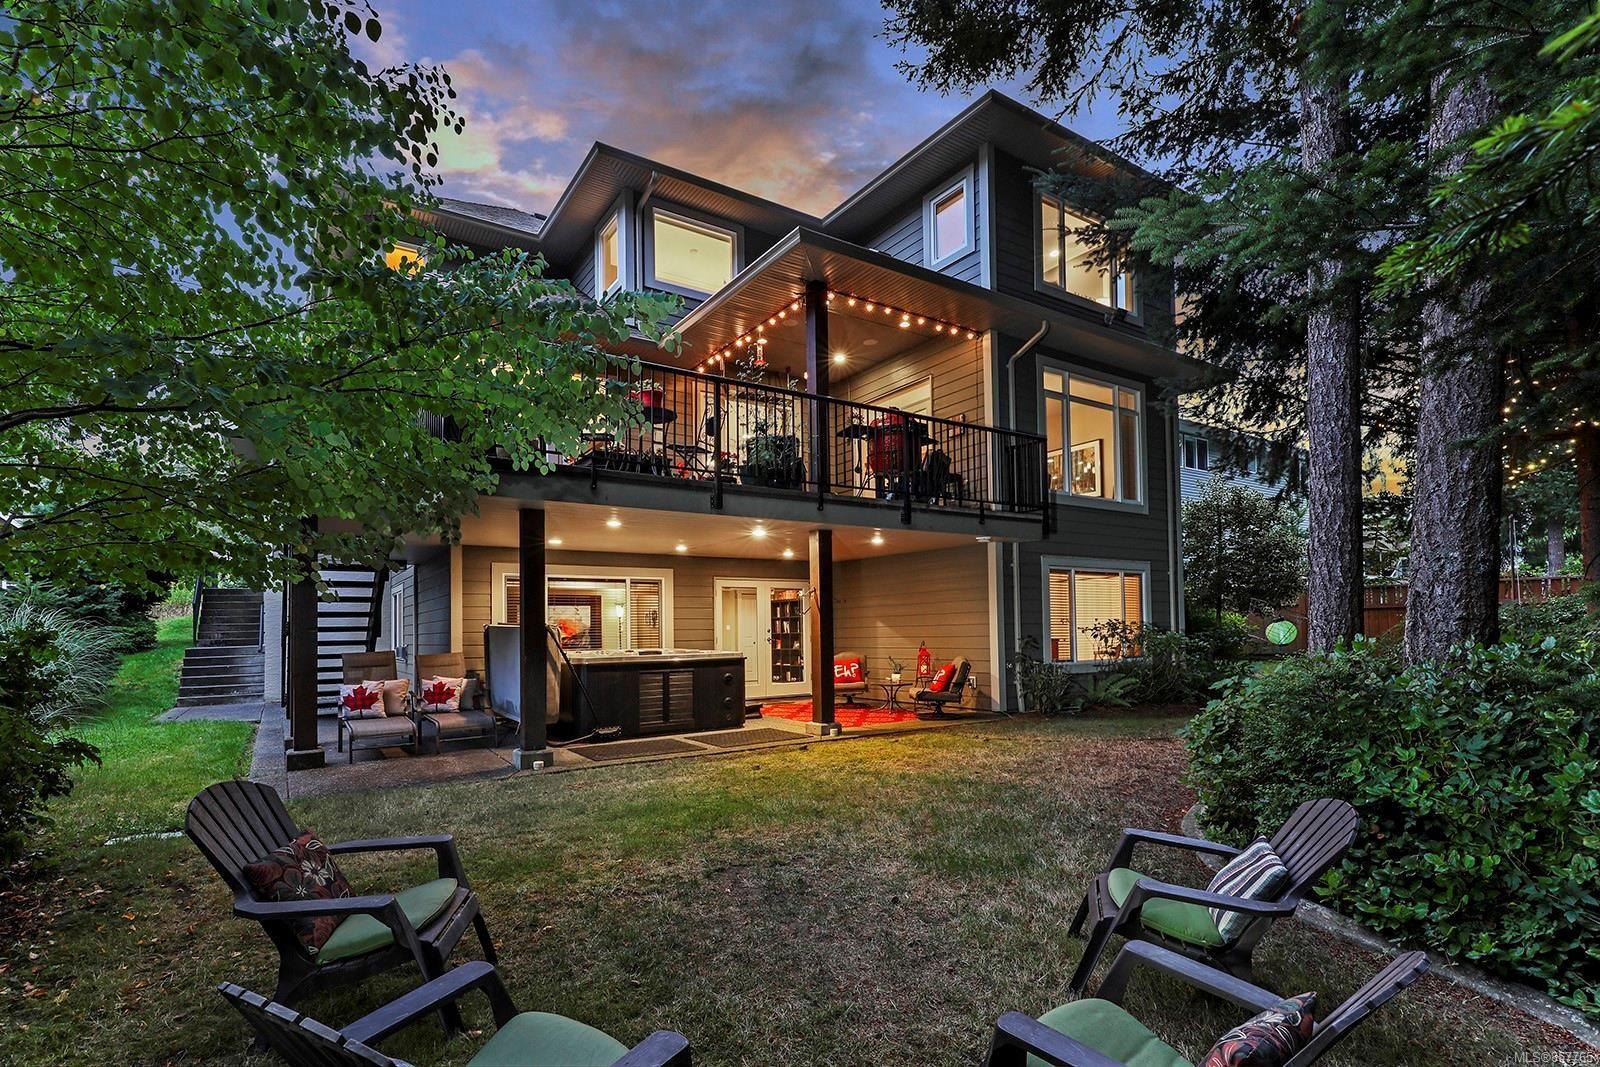 Photo 4: Photos: 1516 Highridge Dr in : CV Comox (Town of) House for sale (Comox Valley)  : MLS®# 857765